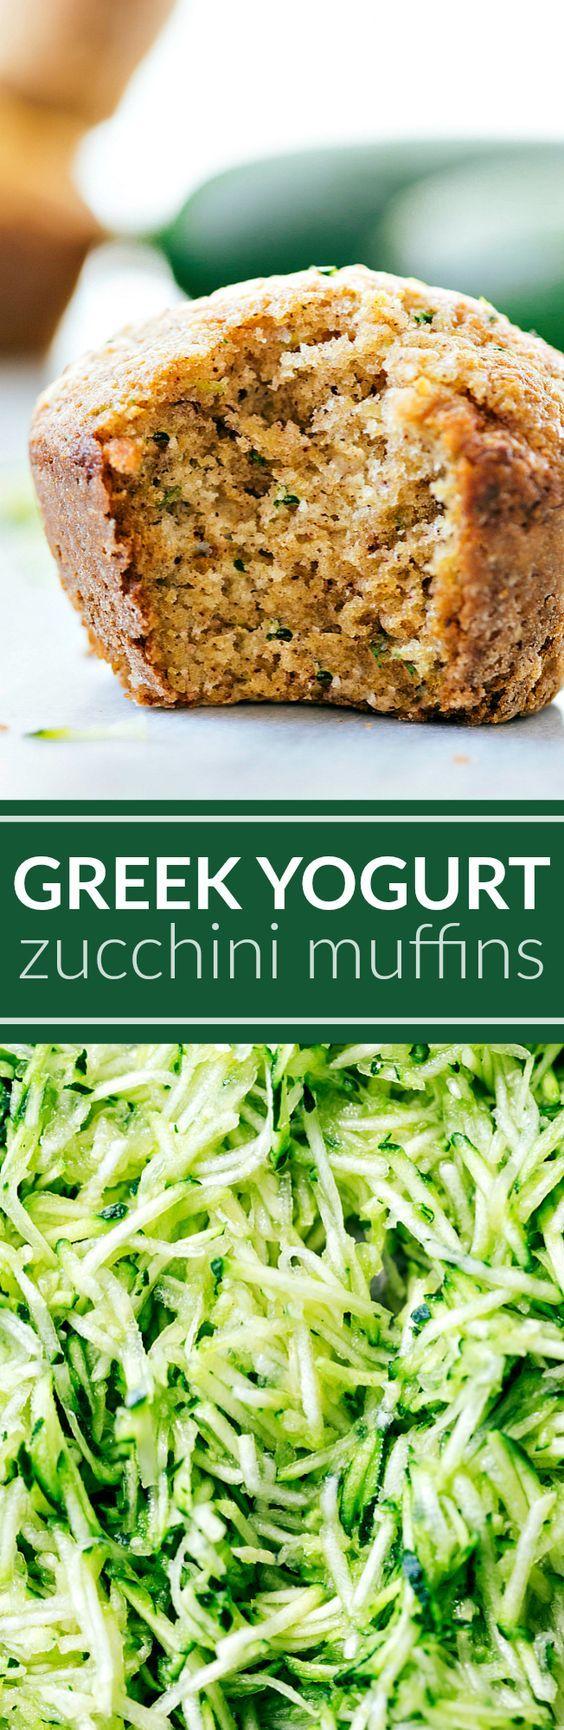 Healthier Greek Yogurt Zucchini Muffins